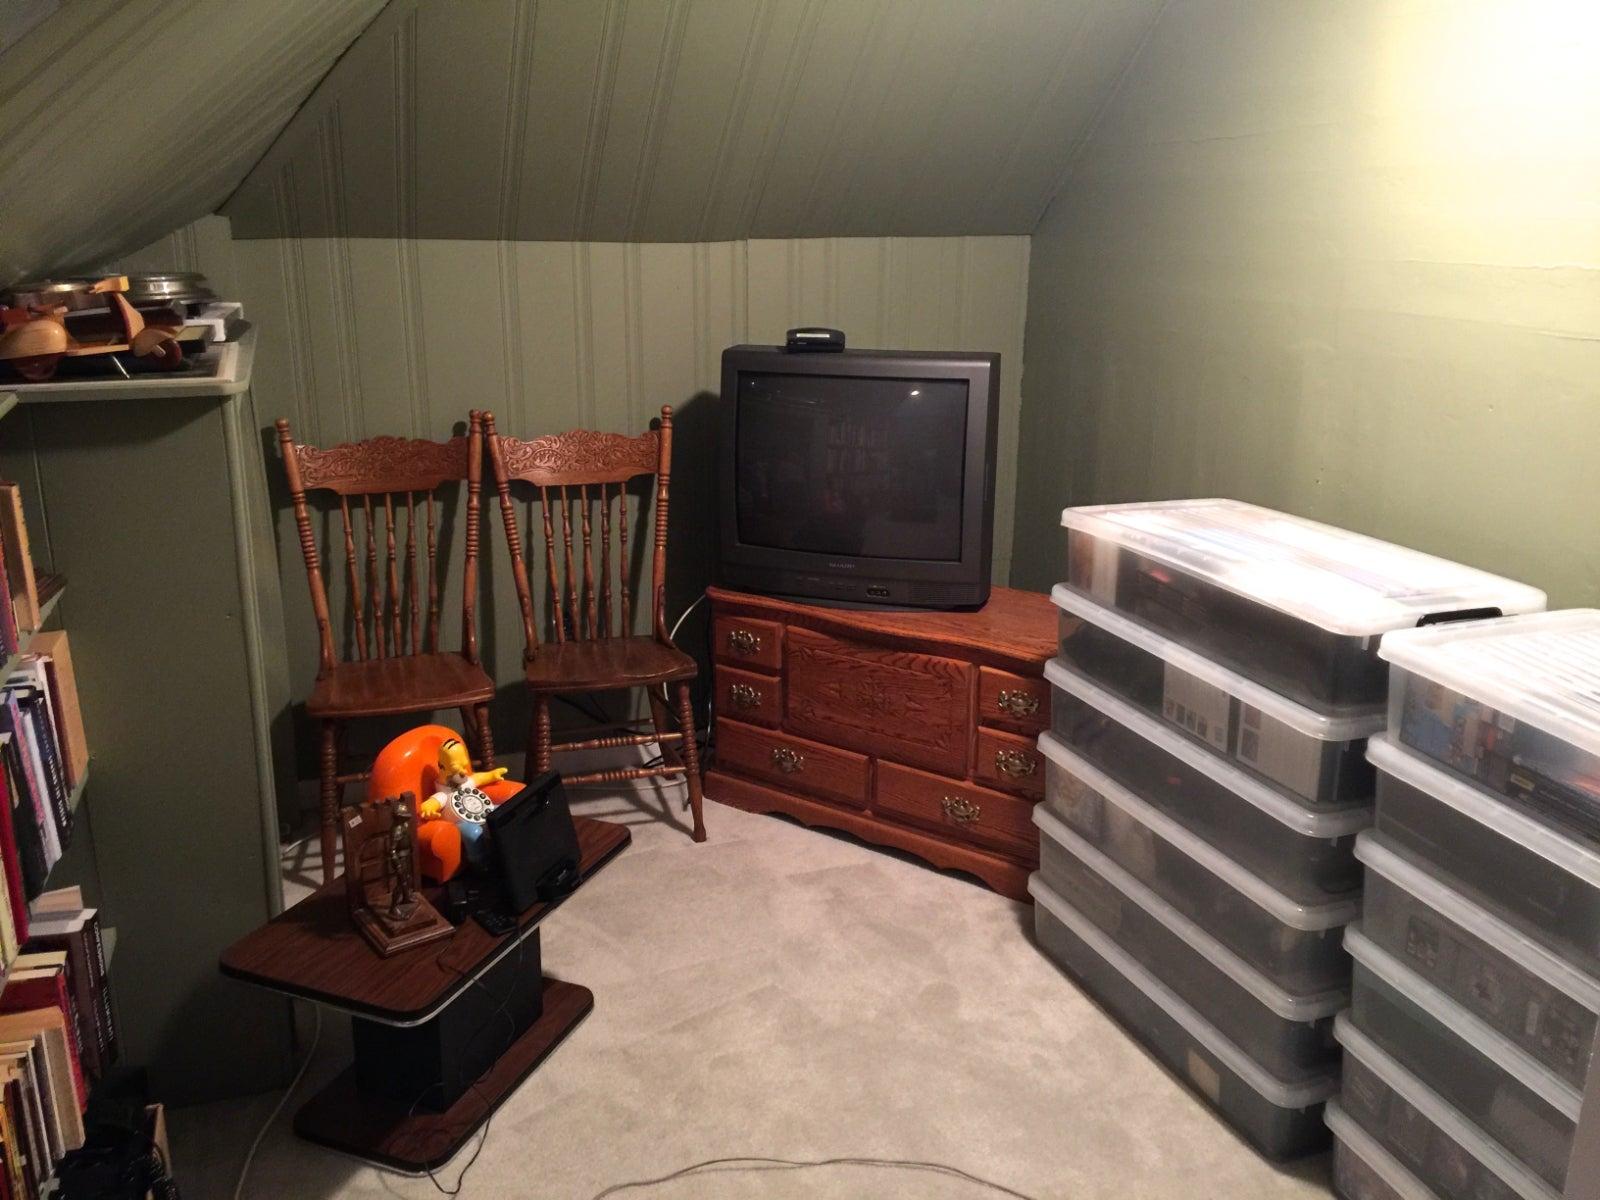 5533 45 Ave, Red Deer, AB  T4N 3L7 - Waskasoo Detached for sale #17